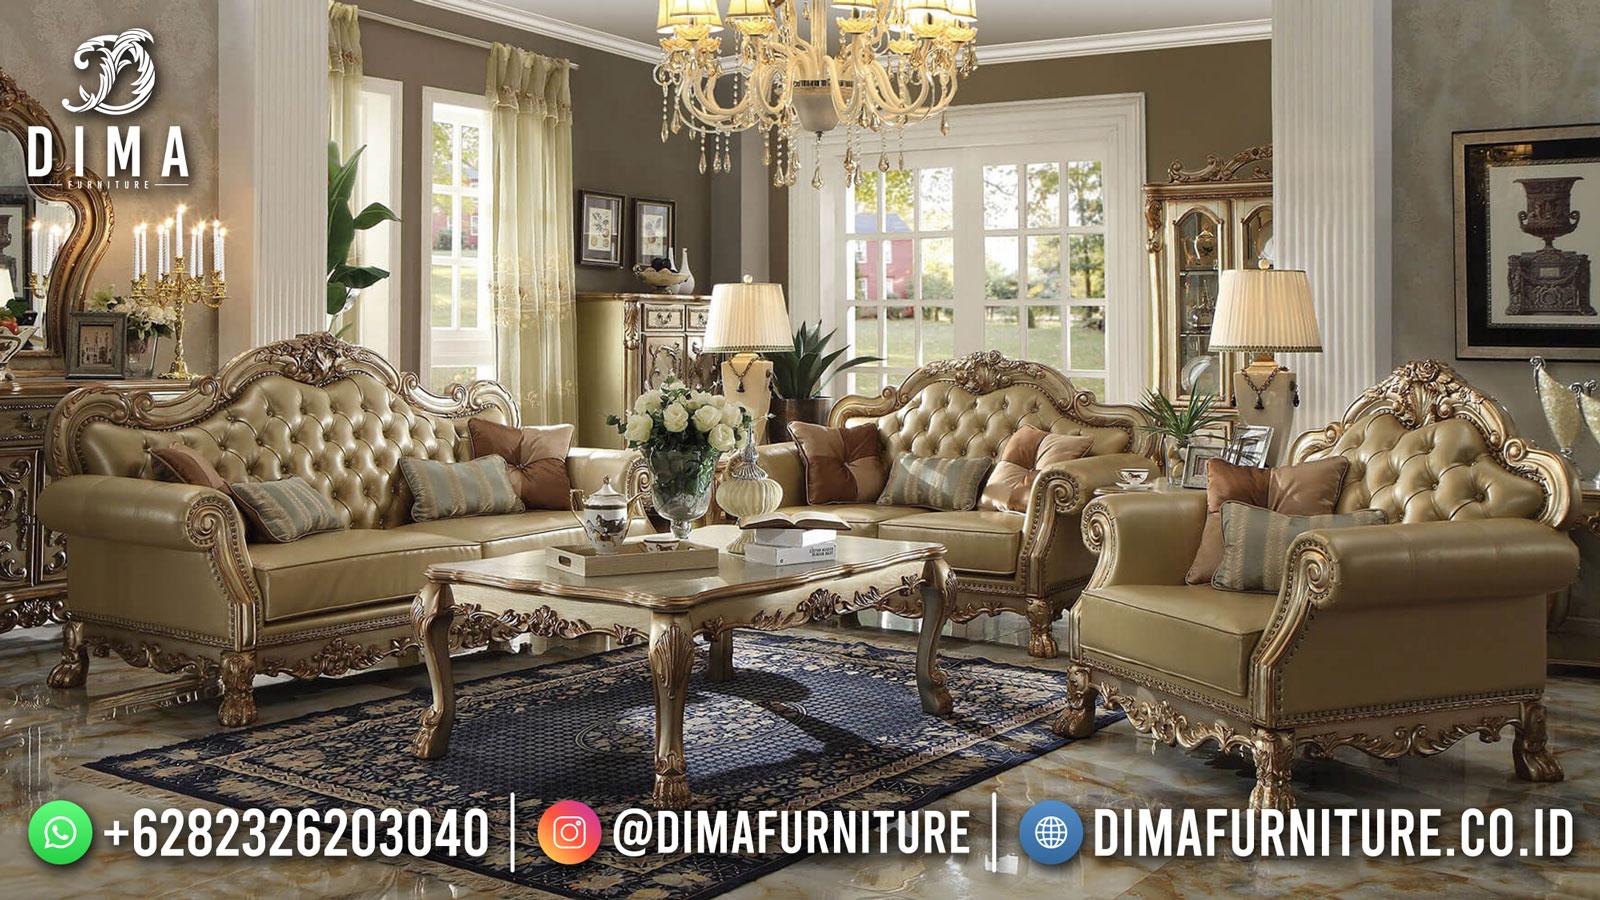 Kursi Sofa Tamu Ukir Mewah Jepara Luxury Golden Classic Color Greatest ST-1510